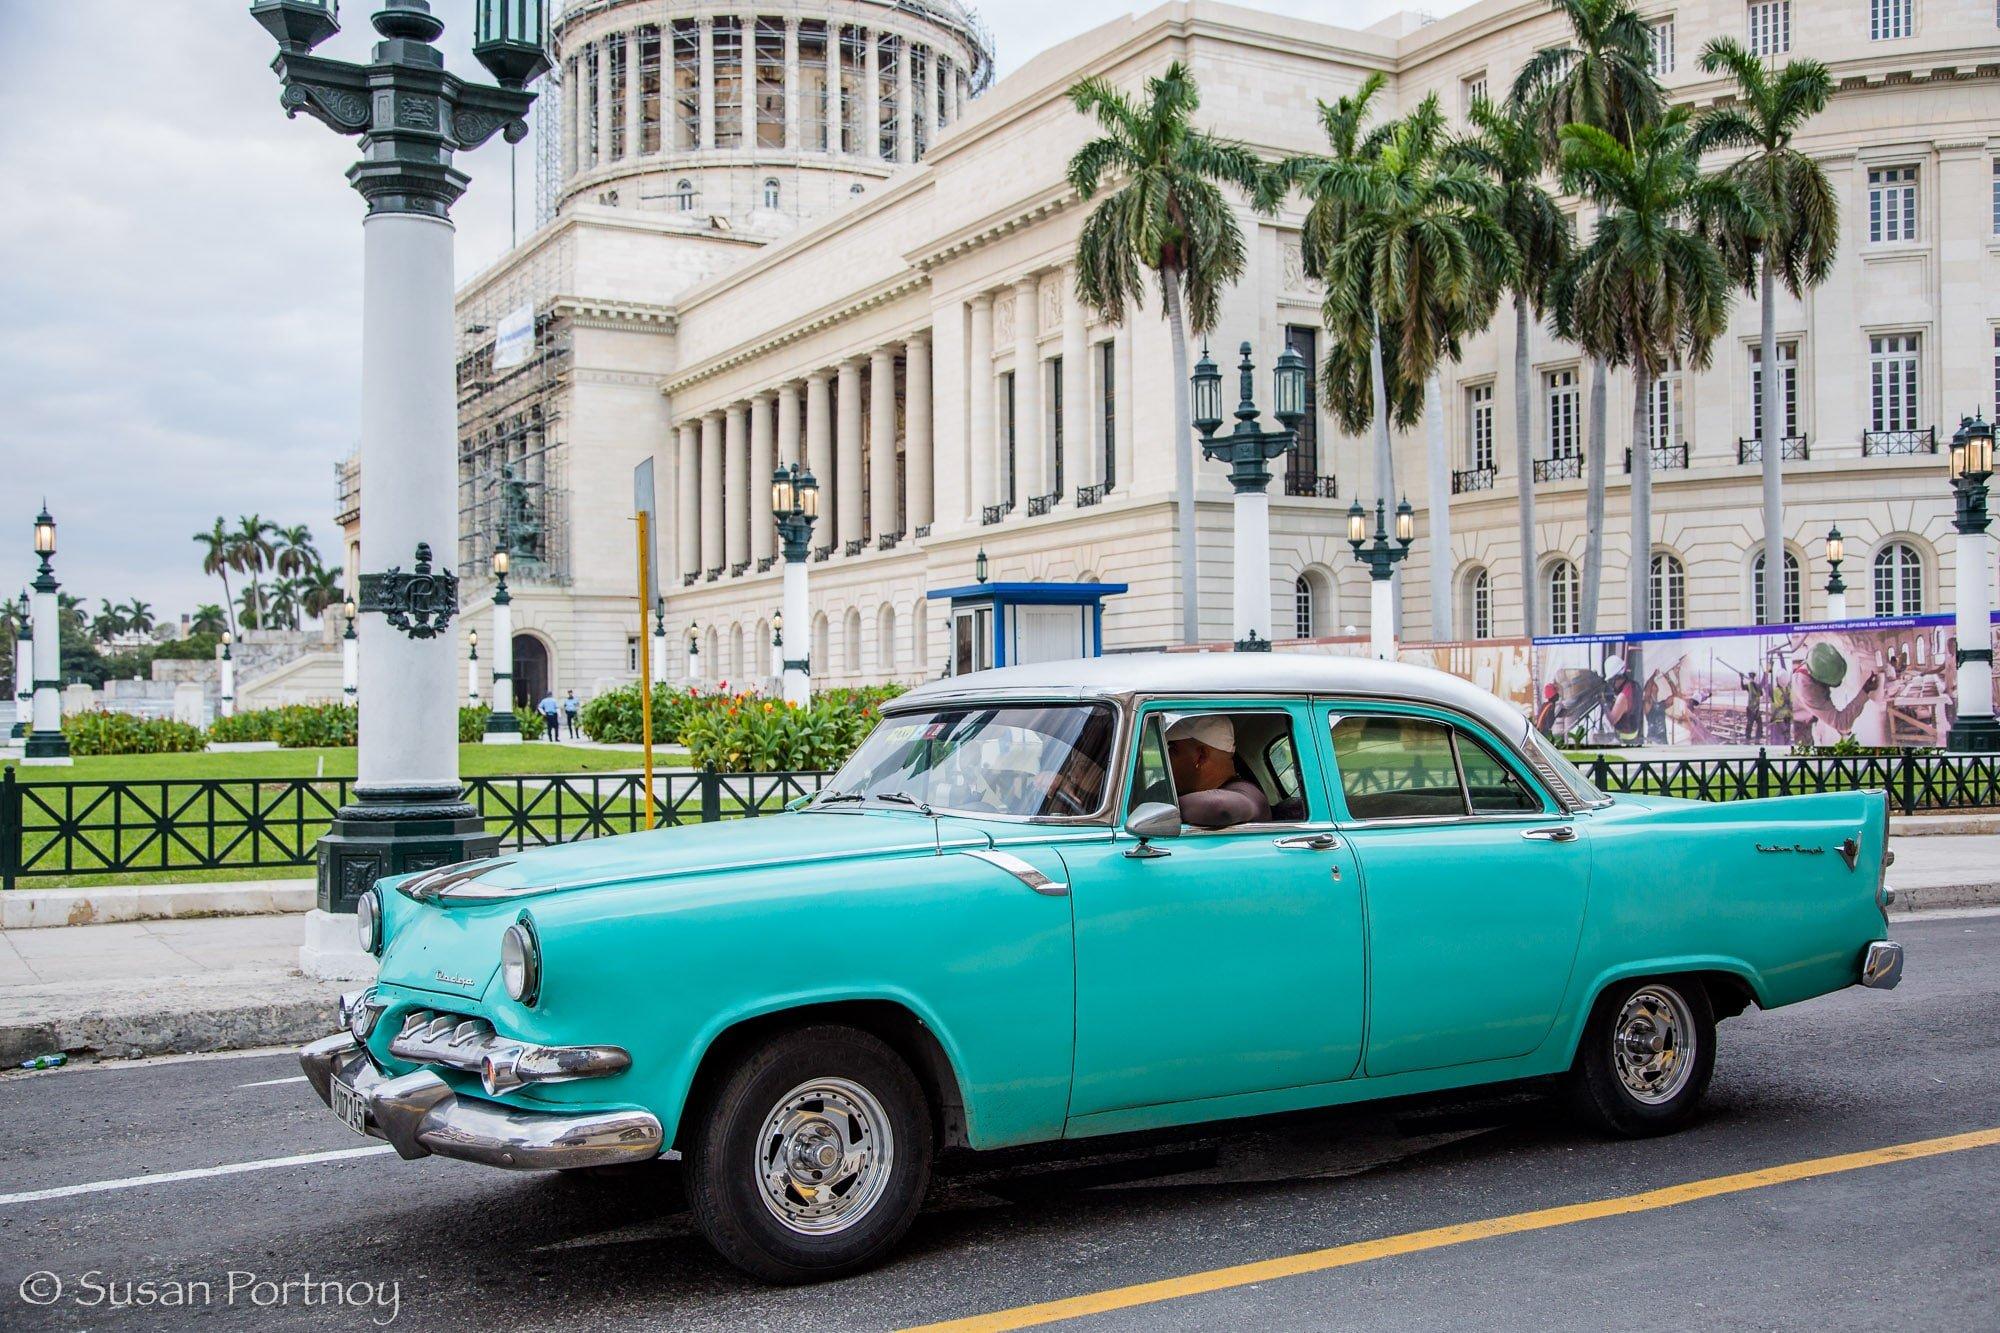 Turquoise classic car in Havana, Cuba